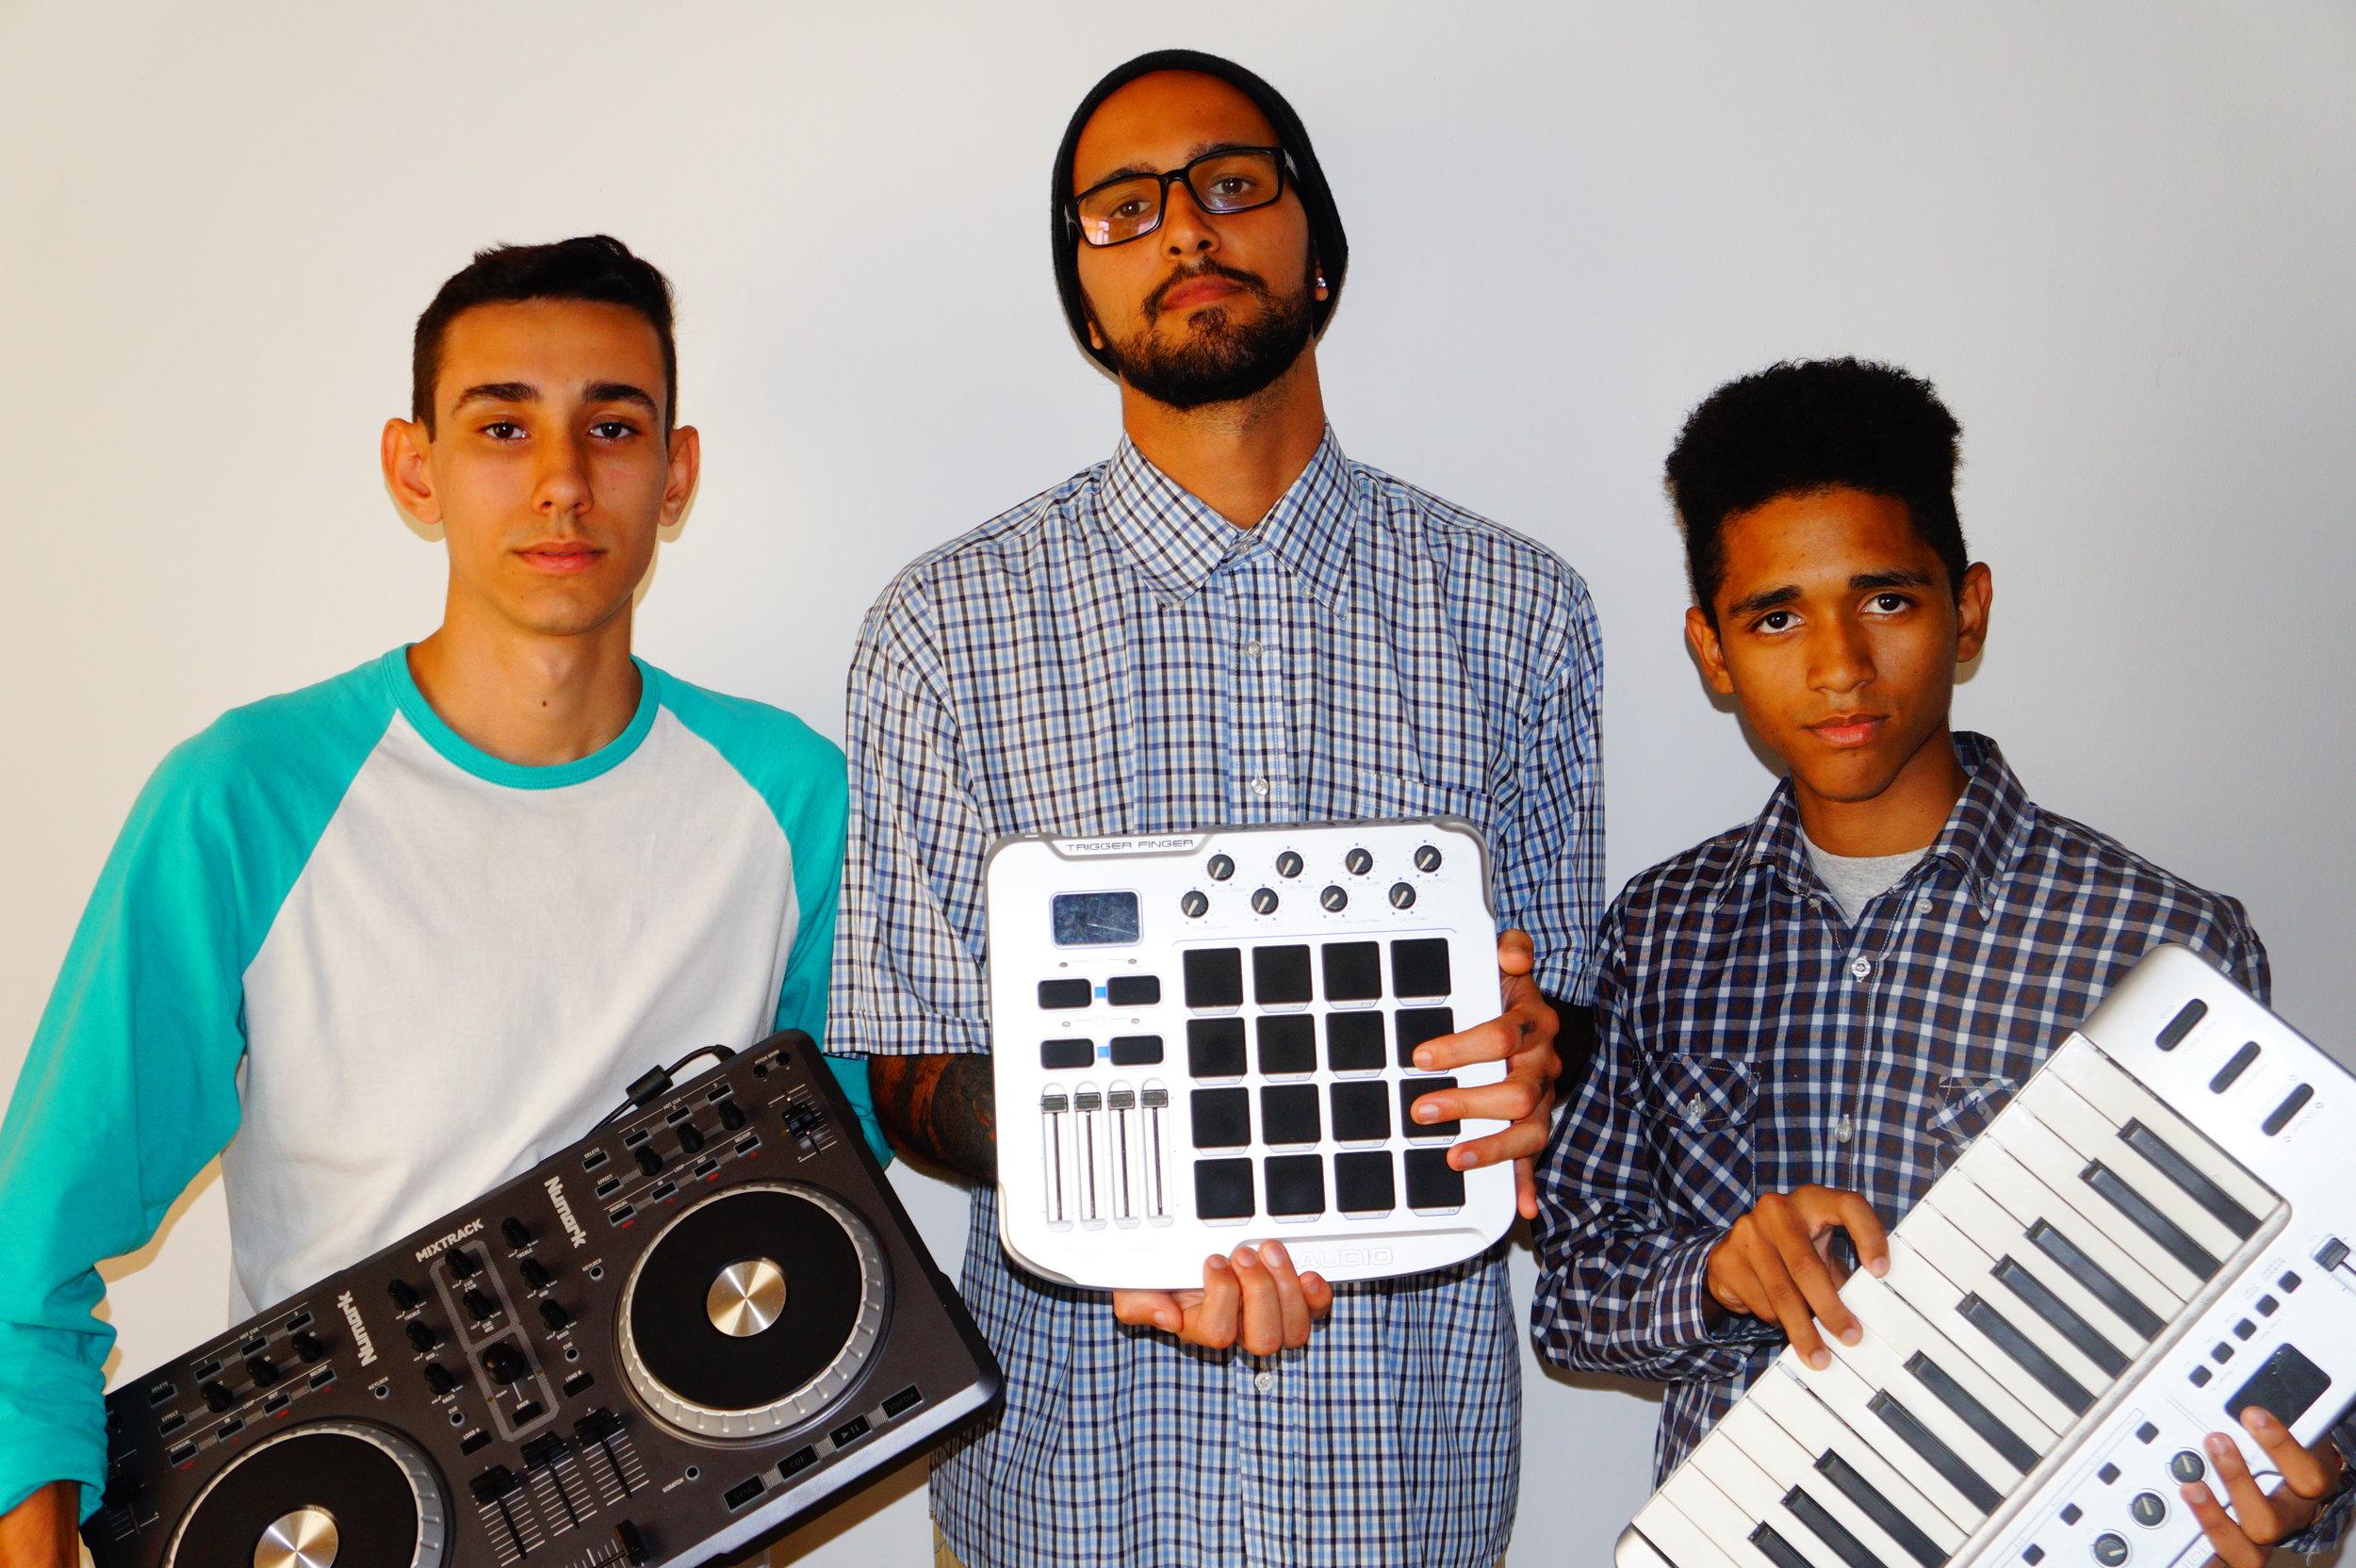 SOUNDSPARX - Trap, Big room, Electronic